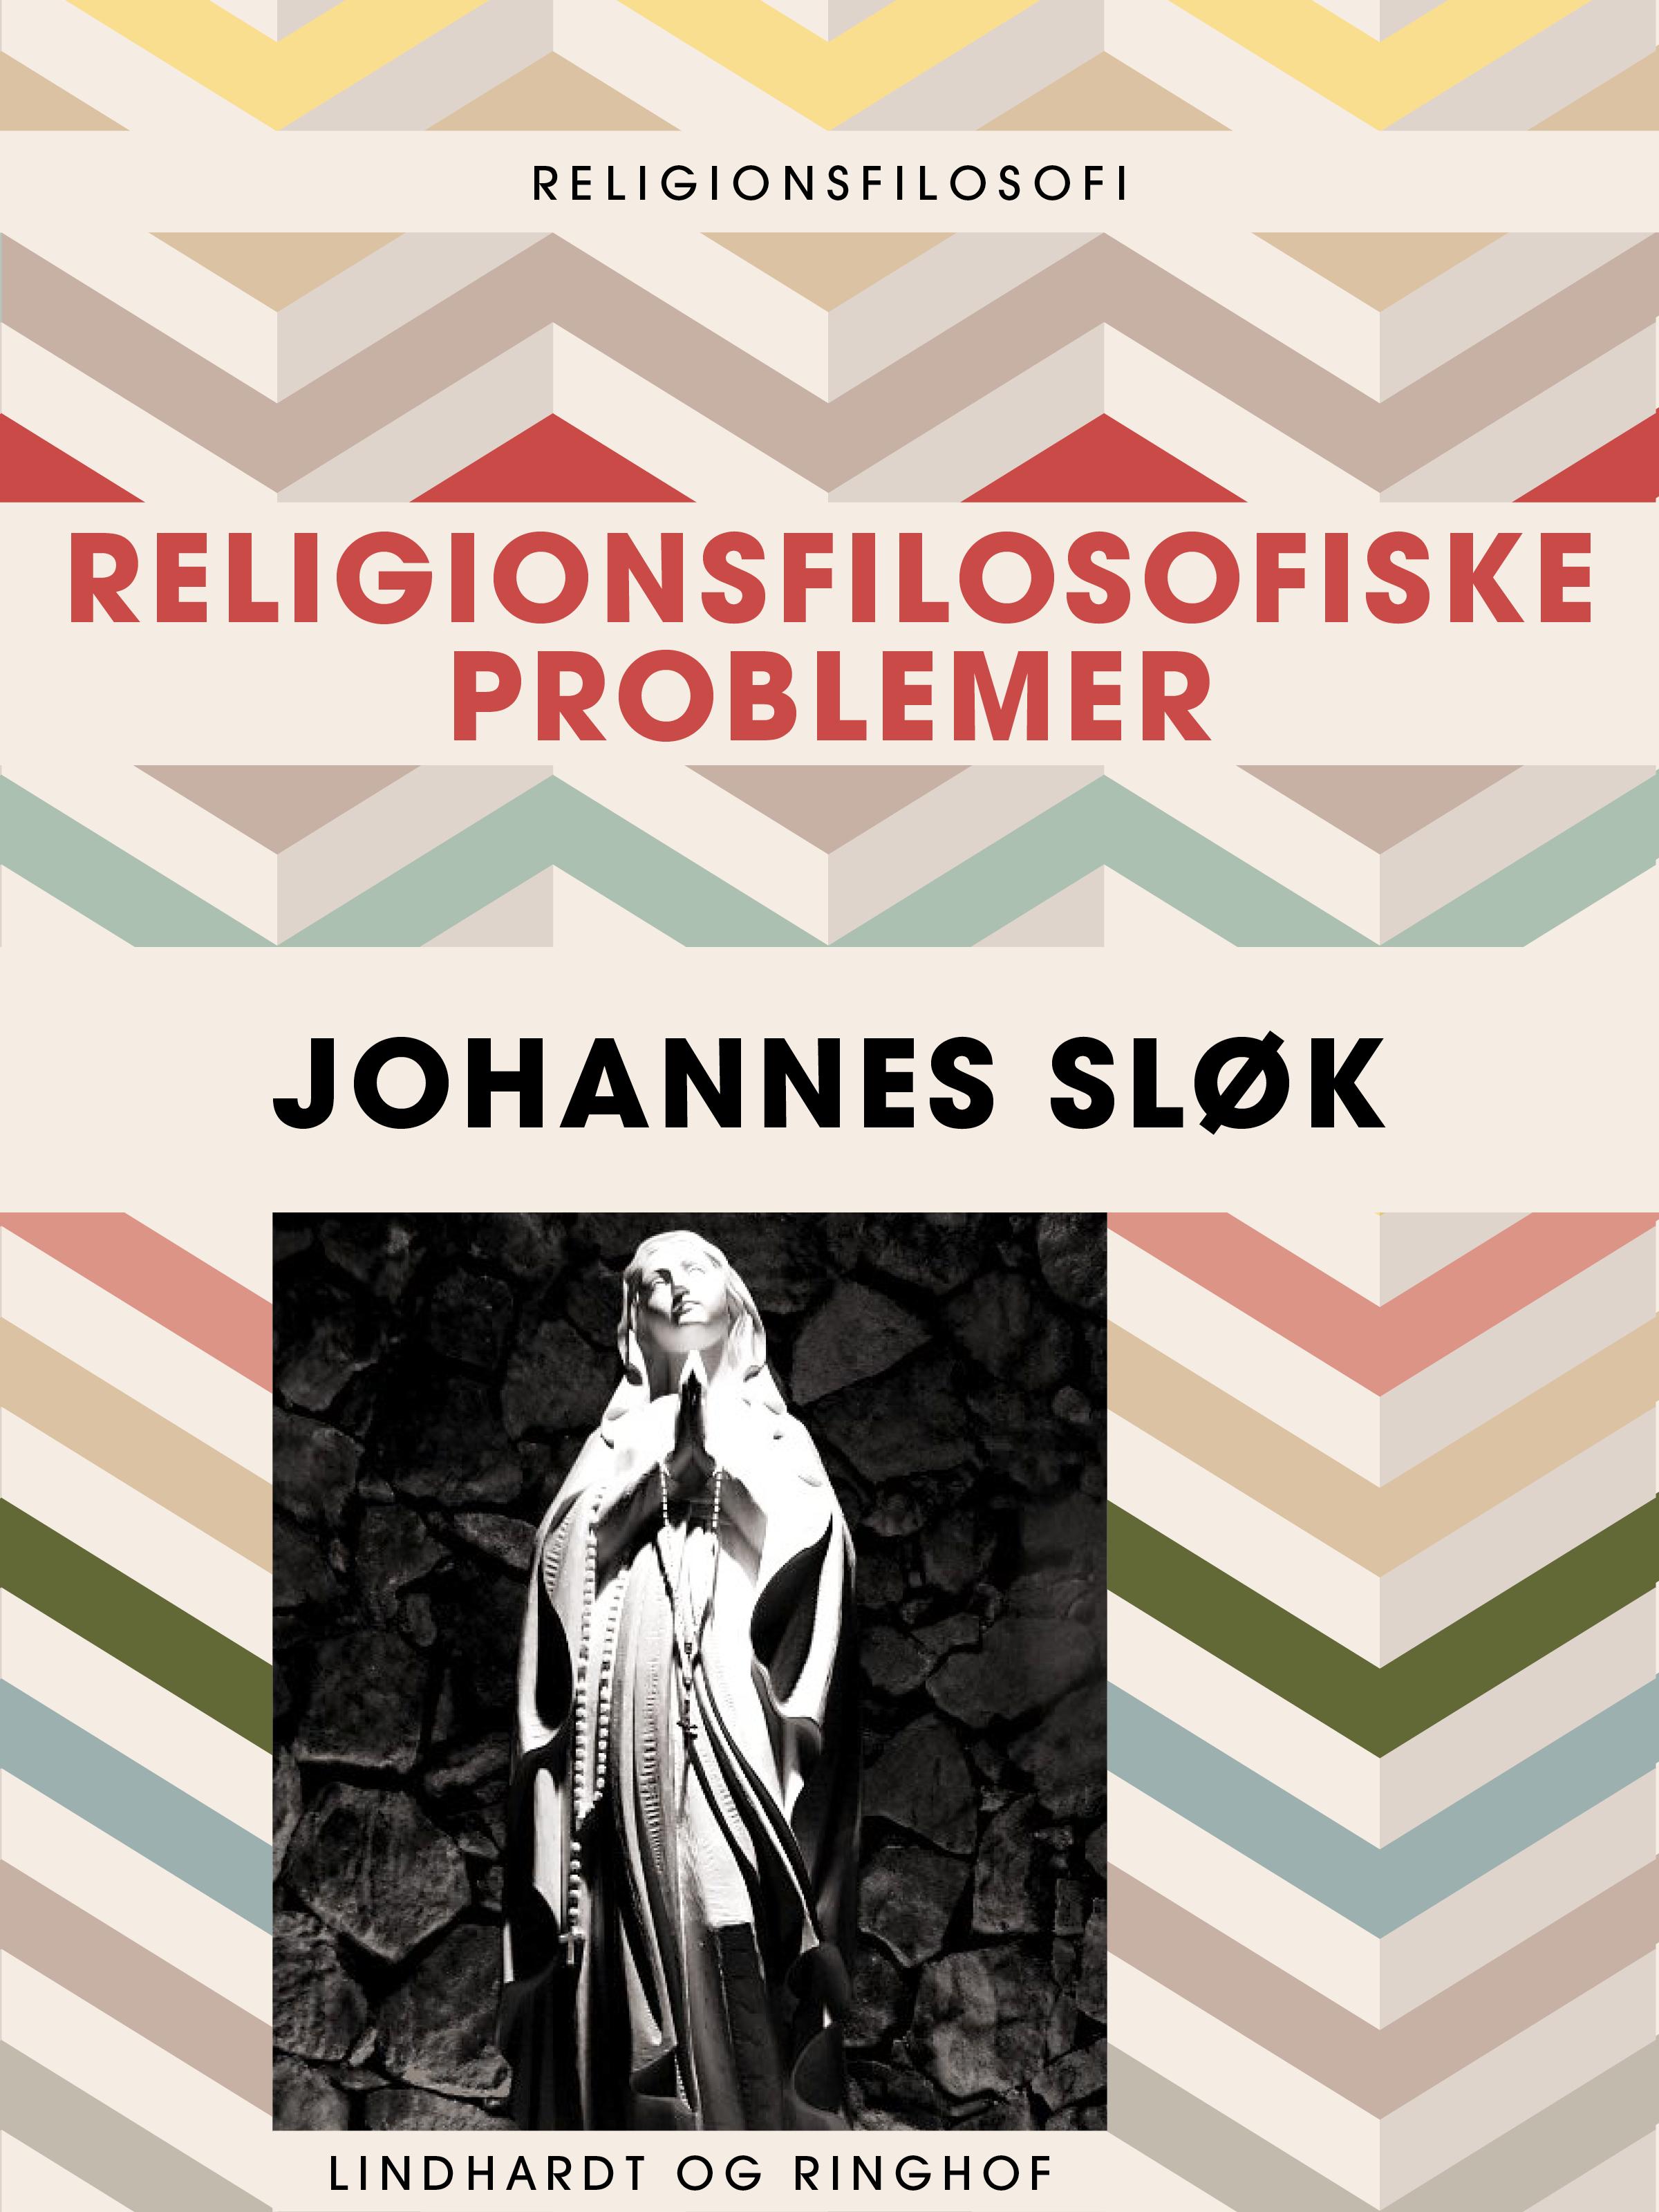 Religionsfilosofiske problemer - e-bog fra N/A fra bog & mystik